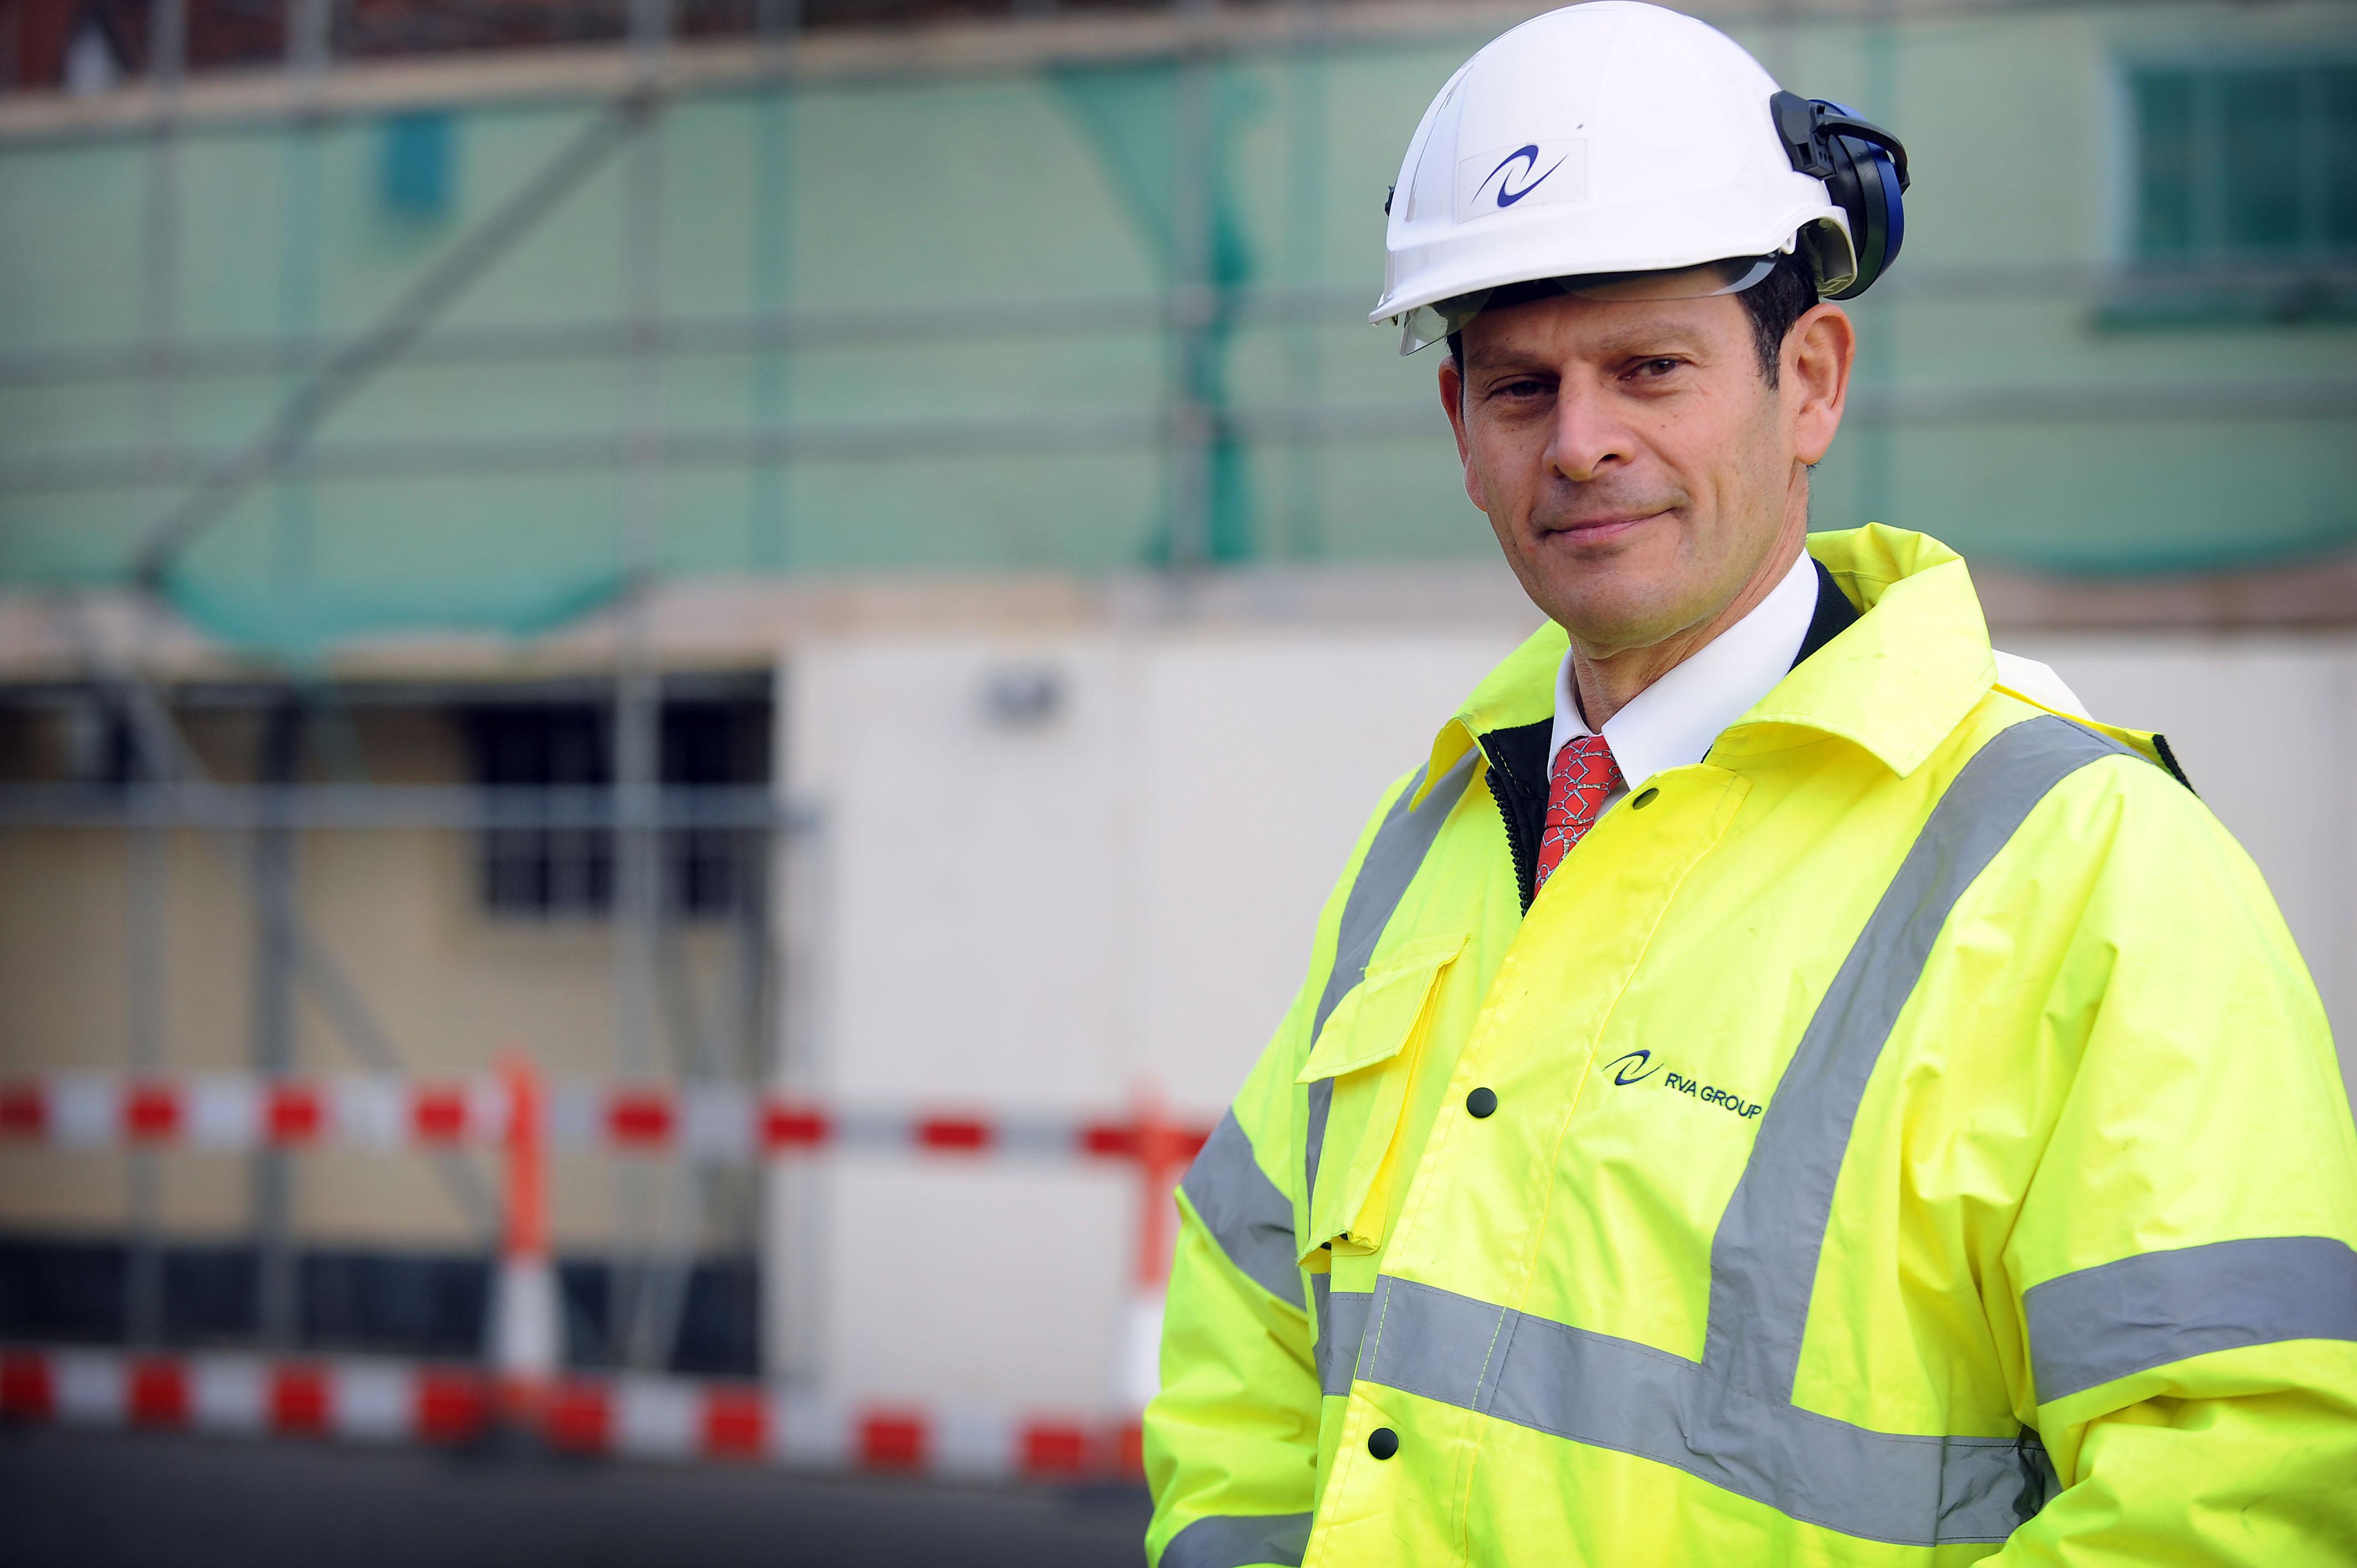 RVA's Richard Vann appointed as Demolition Industry Awards judge